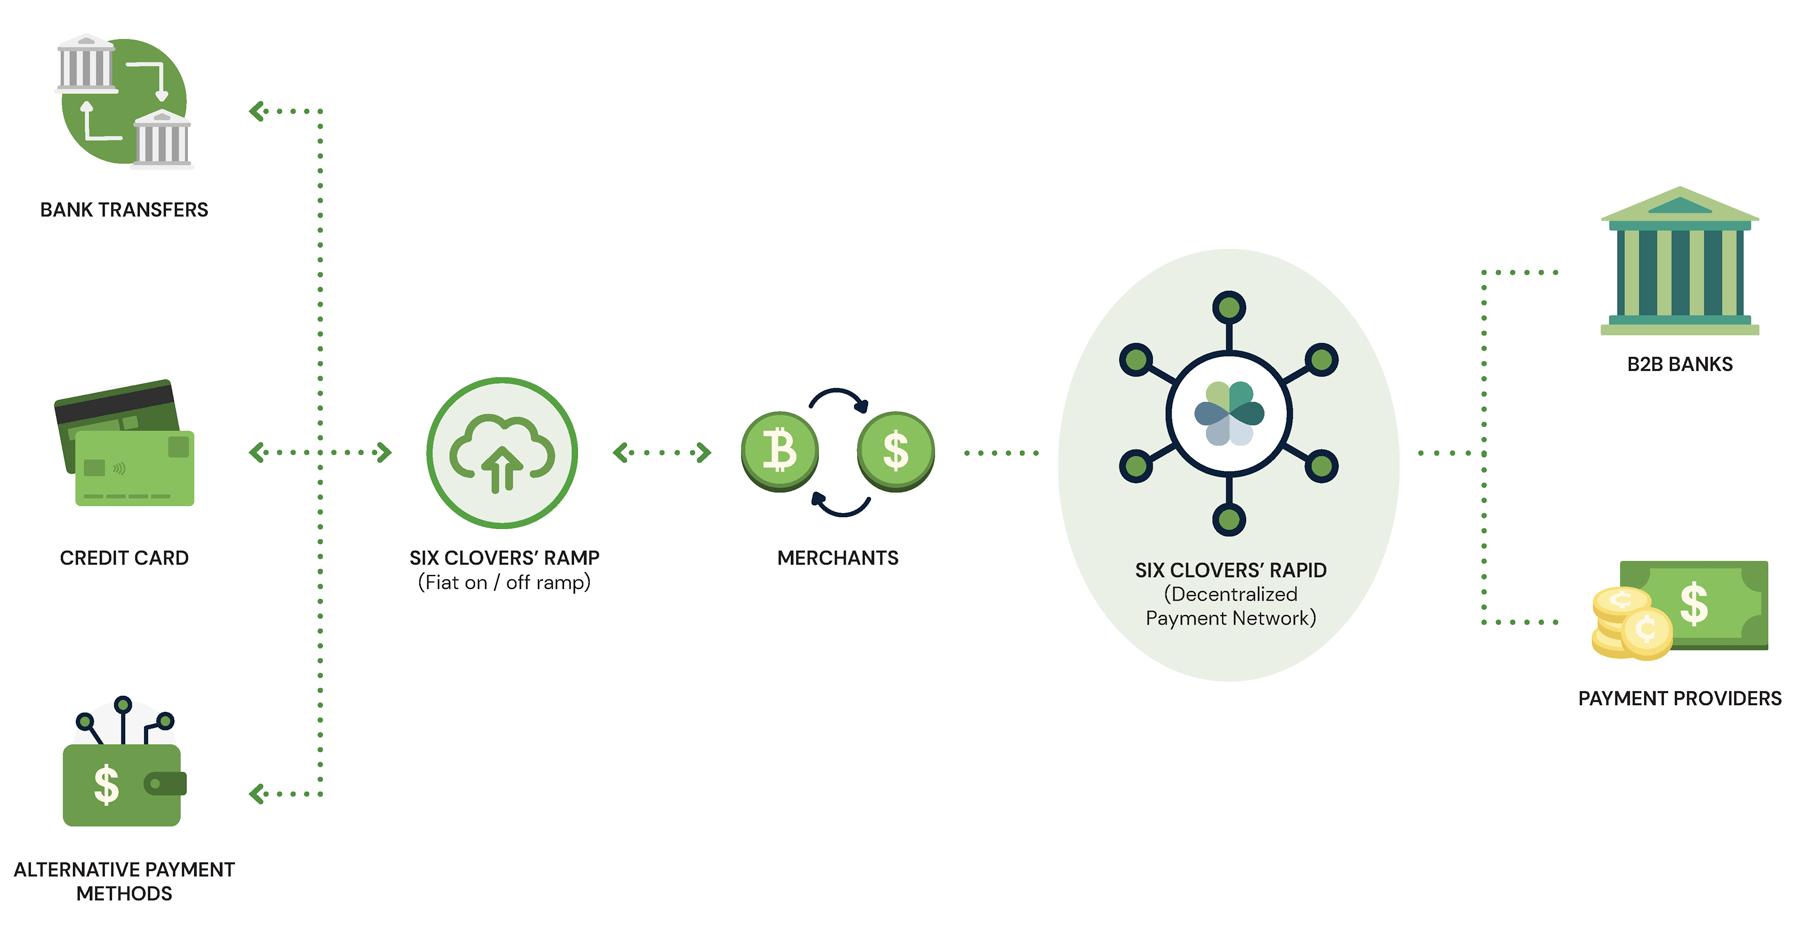 diagram on how six clovers platform works